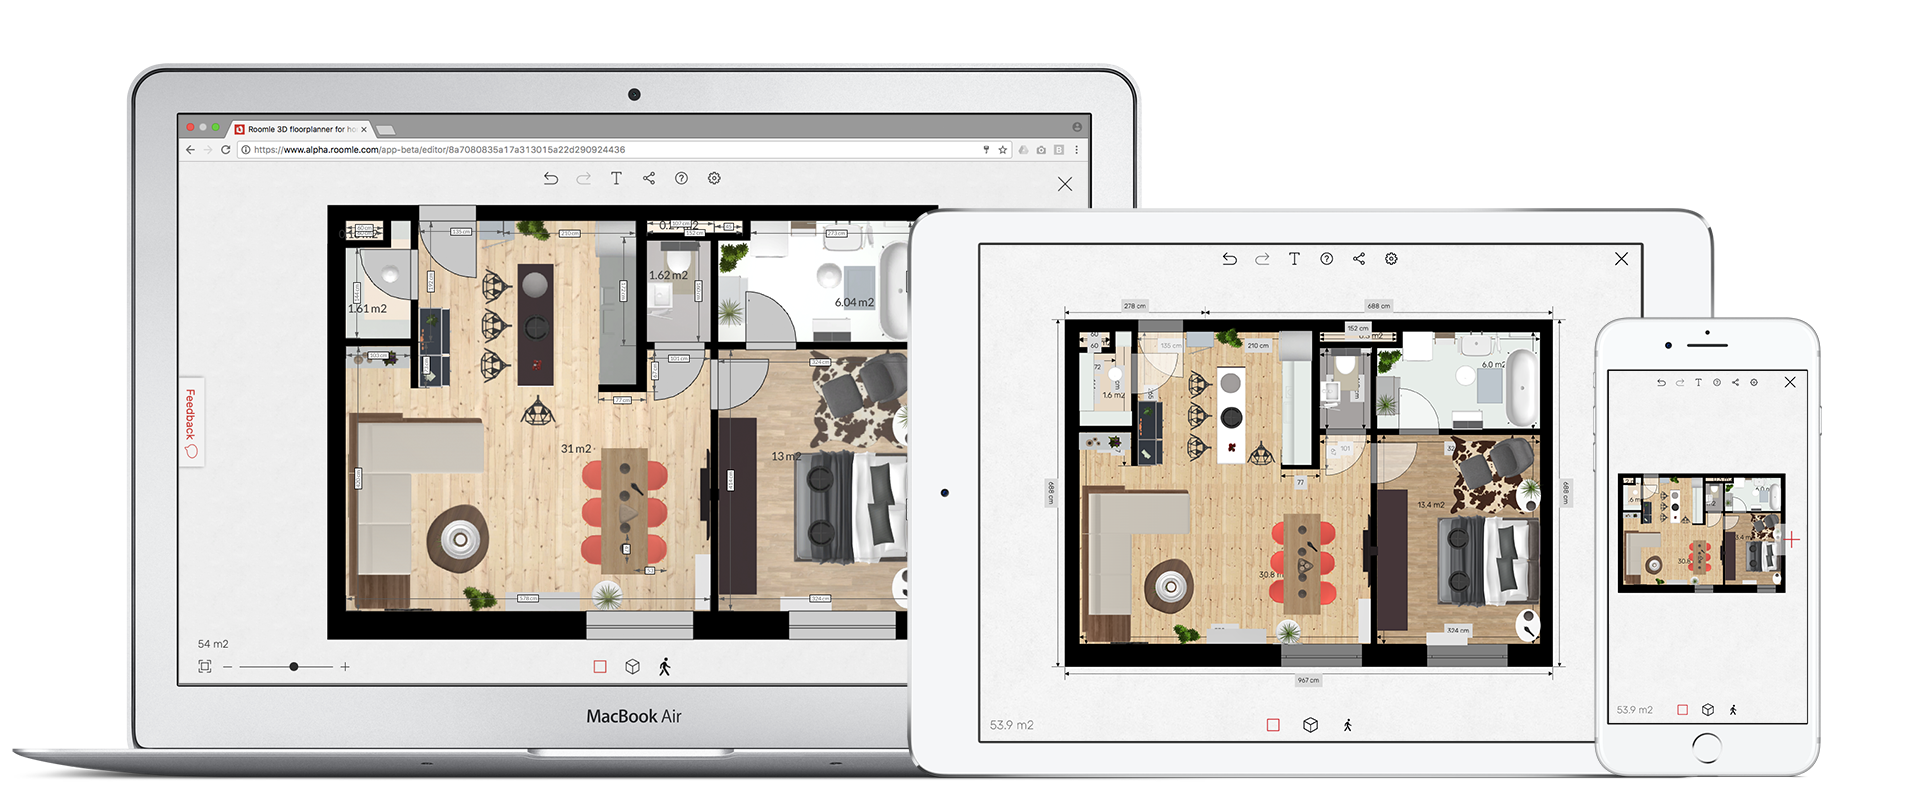 Home Design 3d Ipad Tutorial. interior design for ipad the most ...